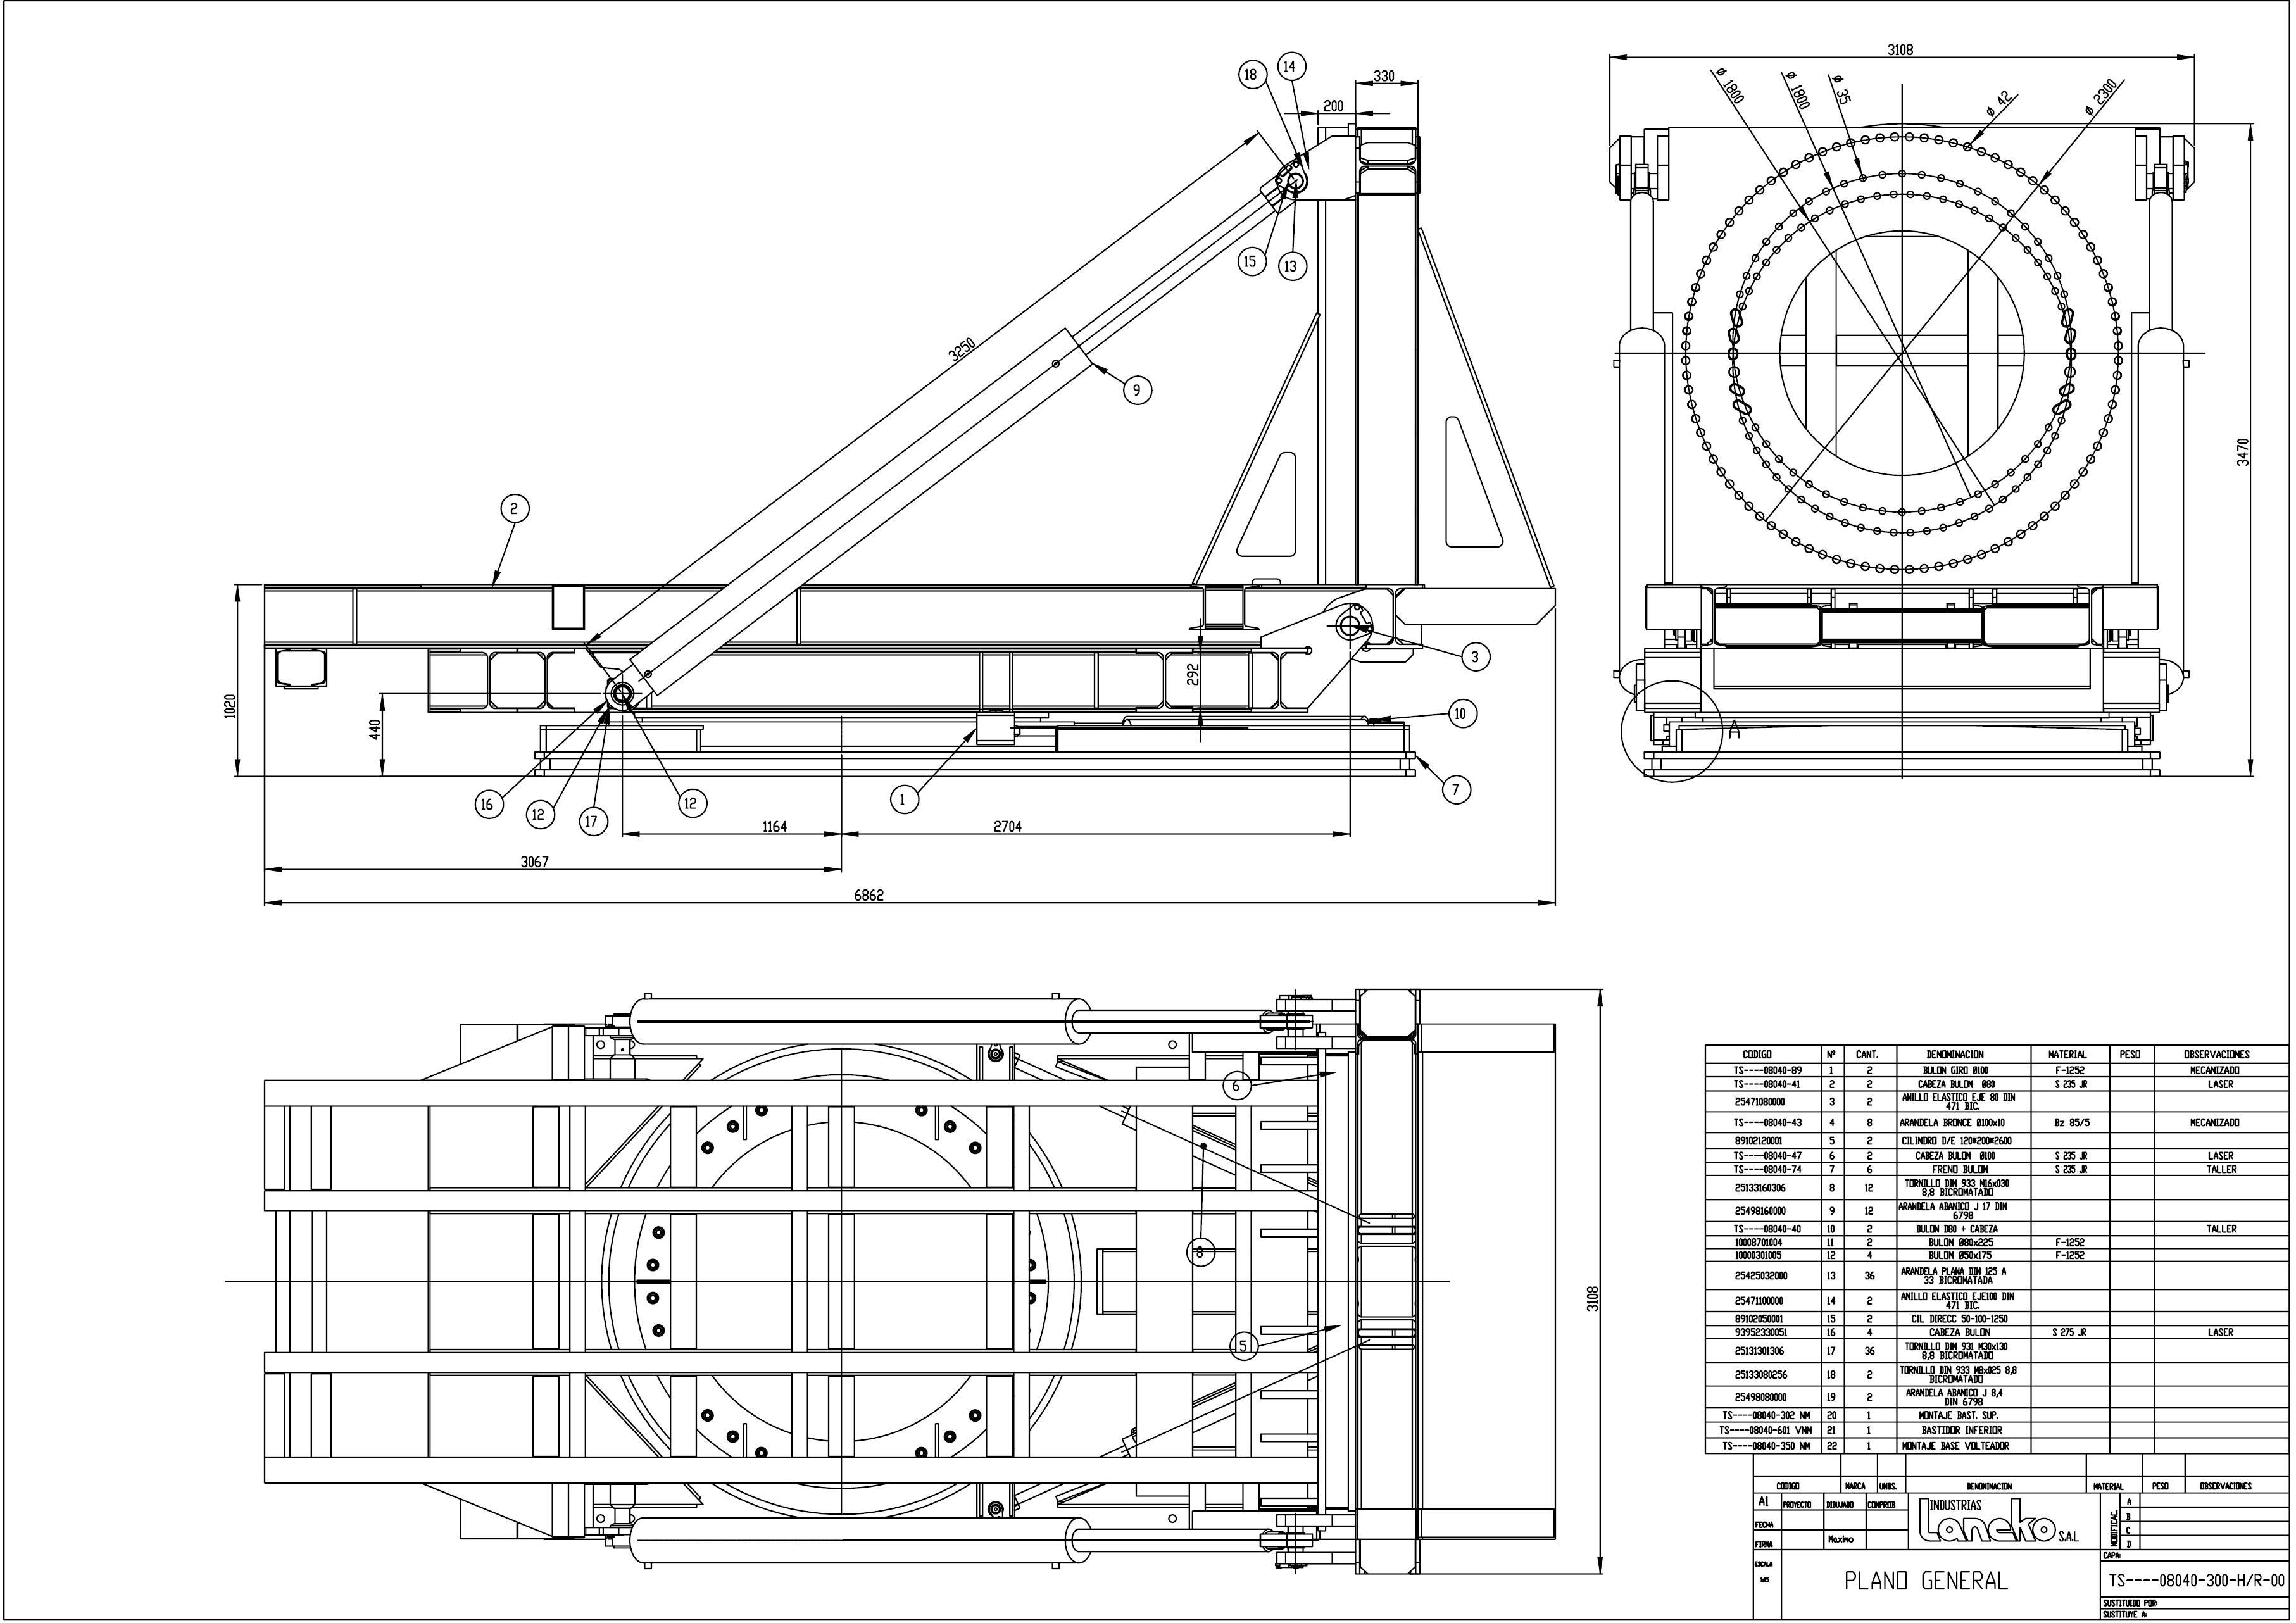 2008 honda element trailer wiring harness diagram honda element cruise control wiring diagram